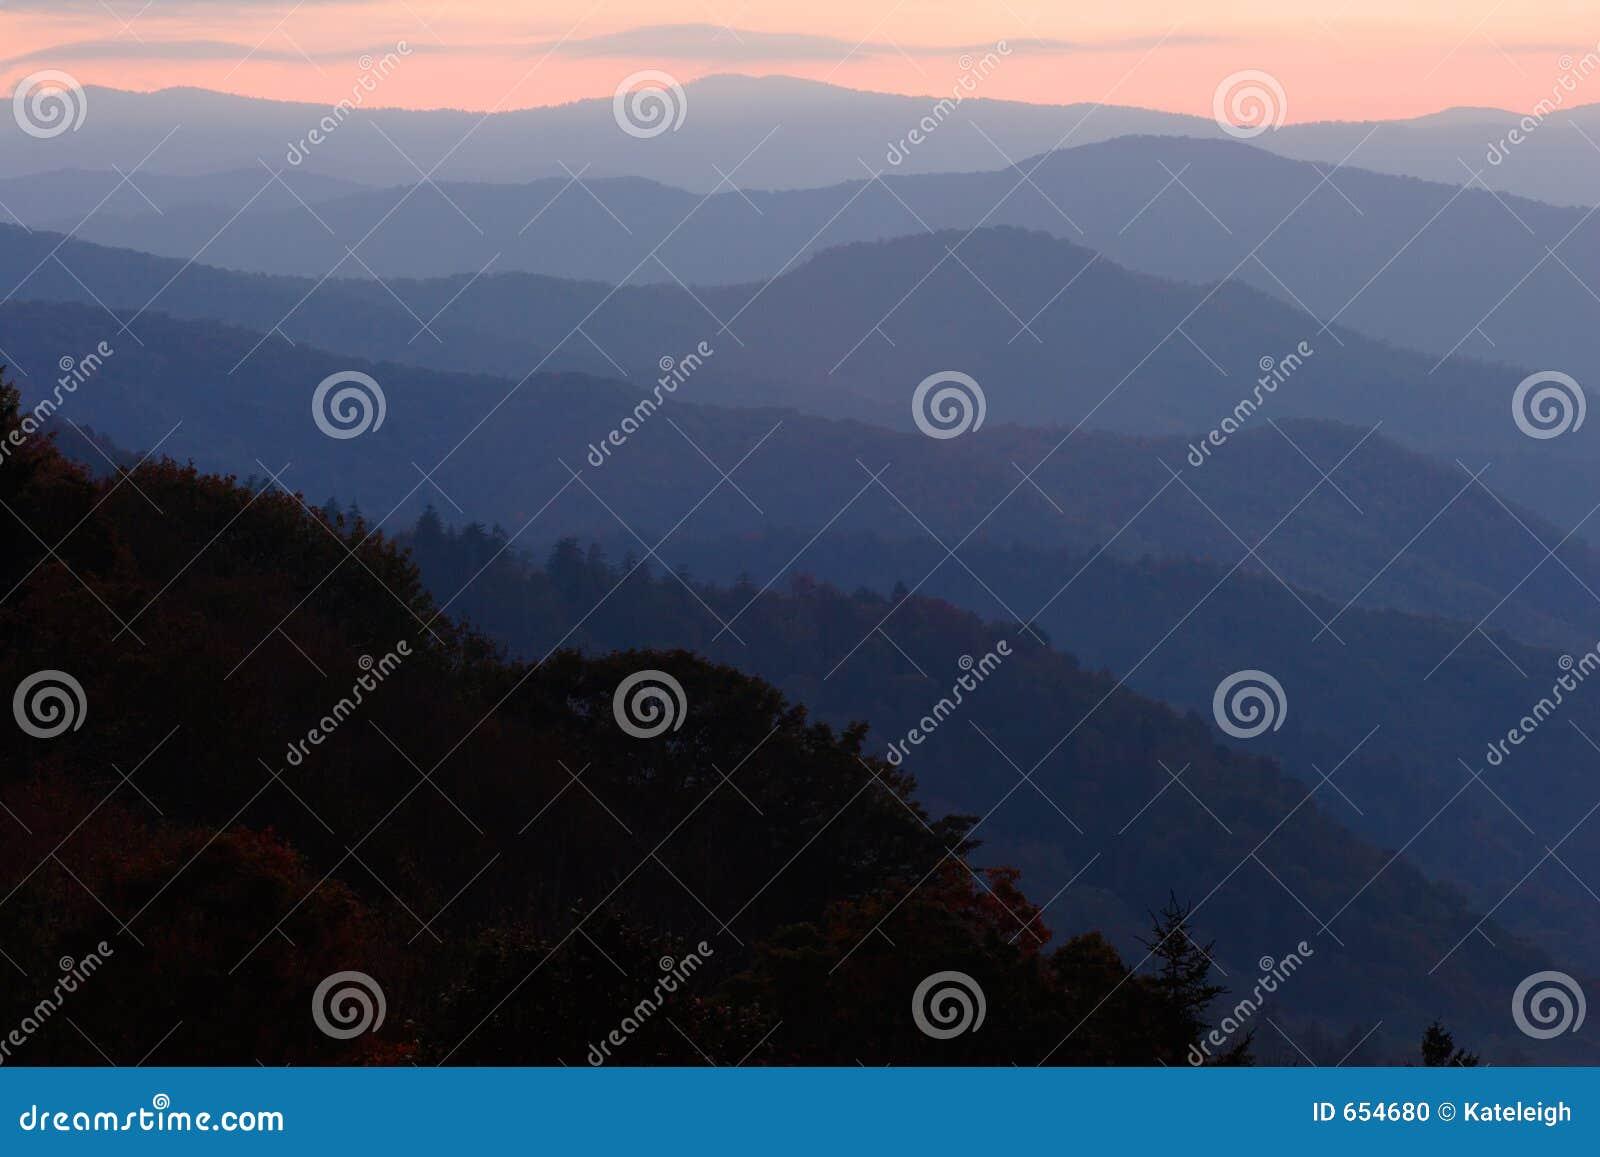 Pastel Mountain Layers